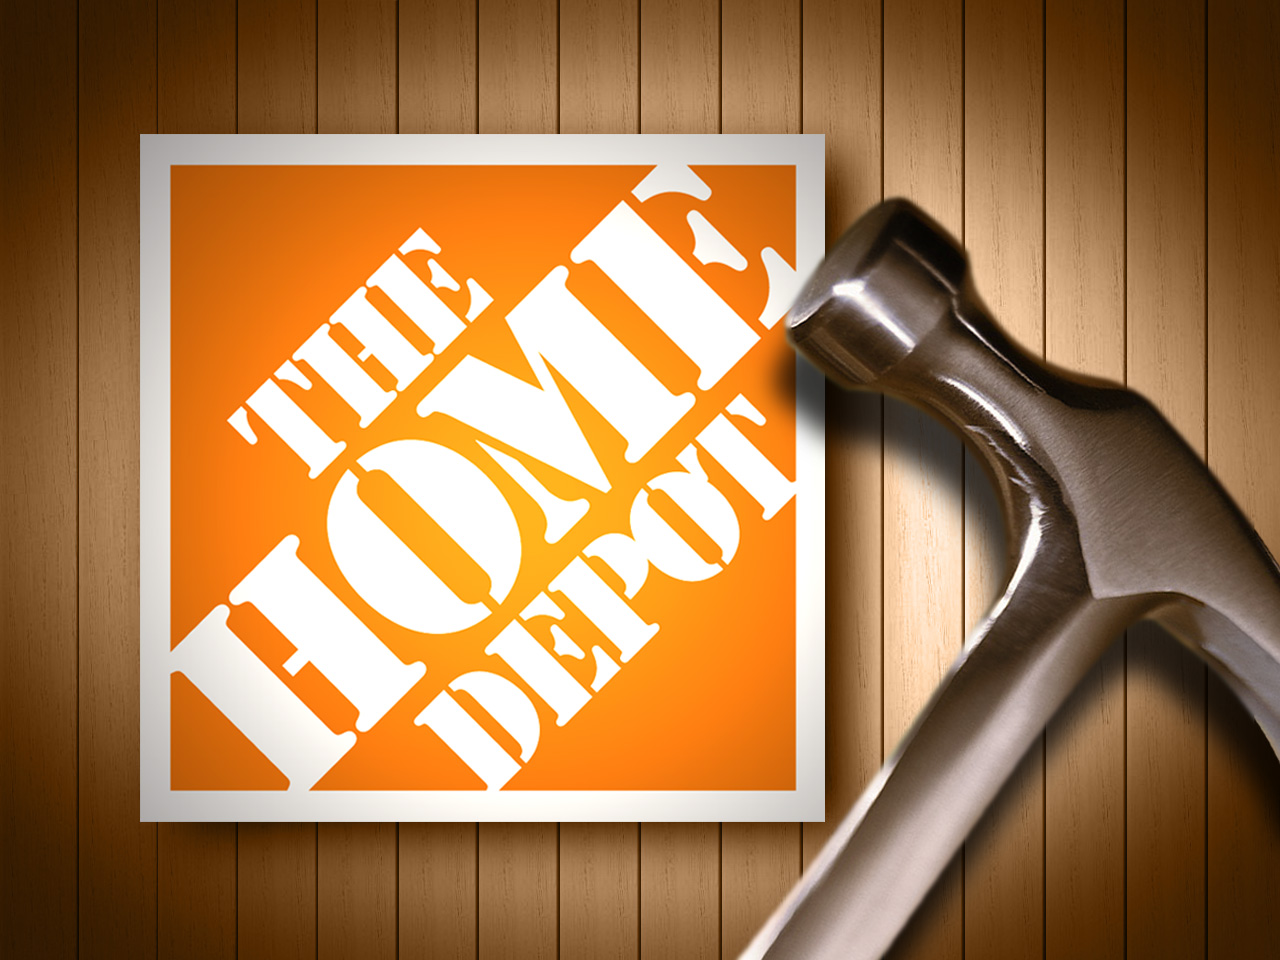 Home Depot Beats Street's Q4 Revenue